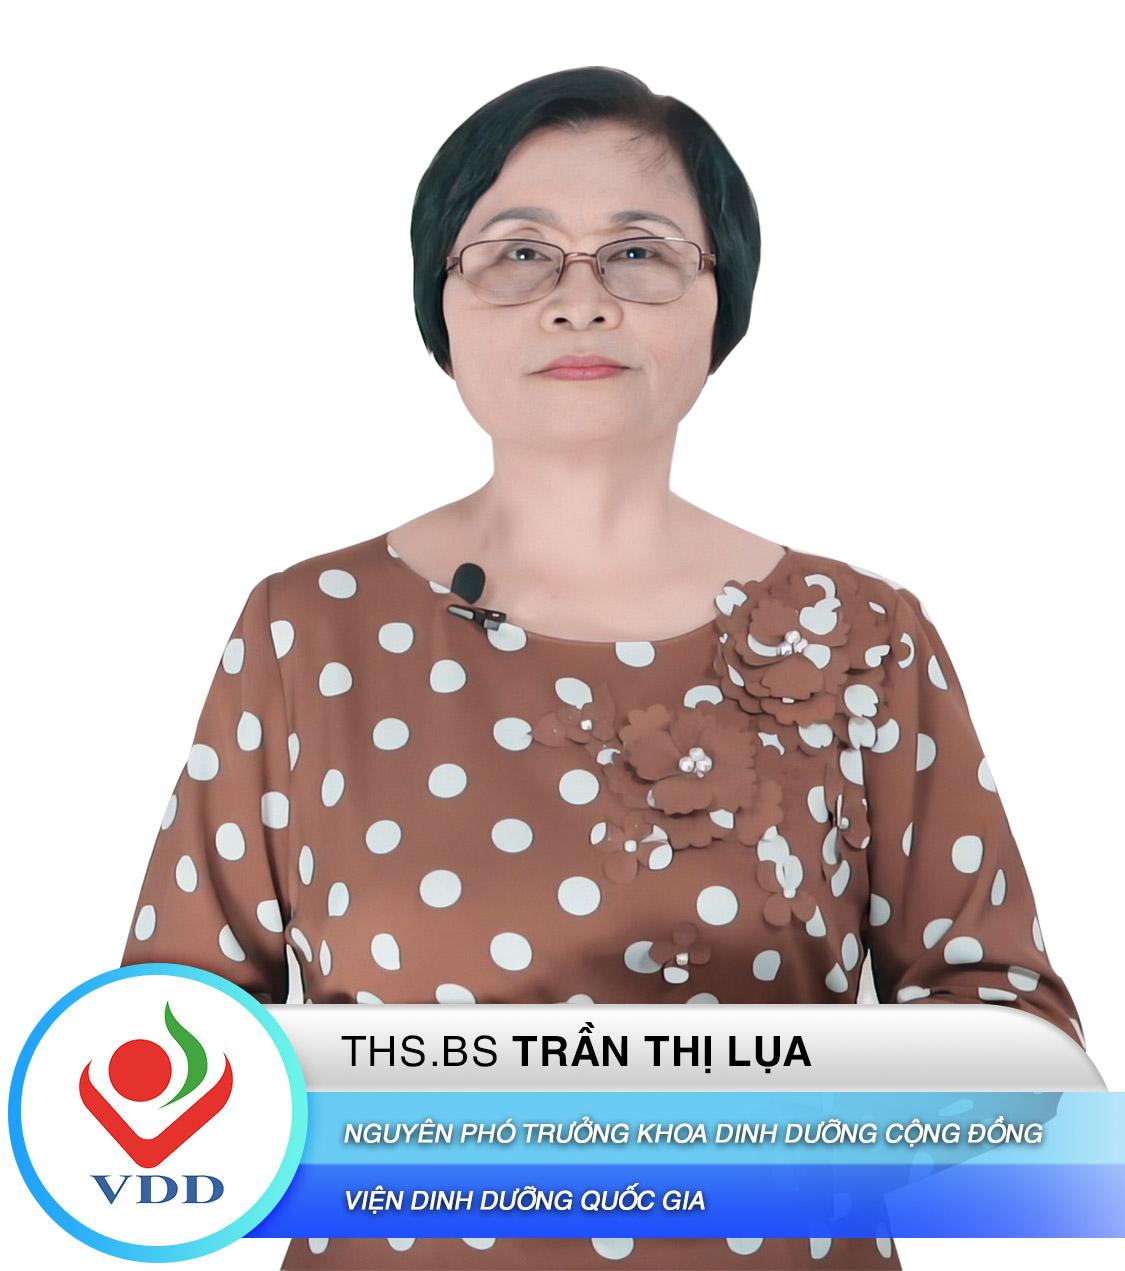 14. Trần Thị Lụa